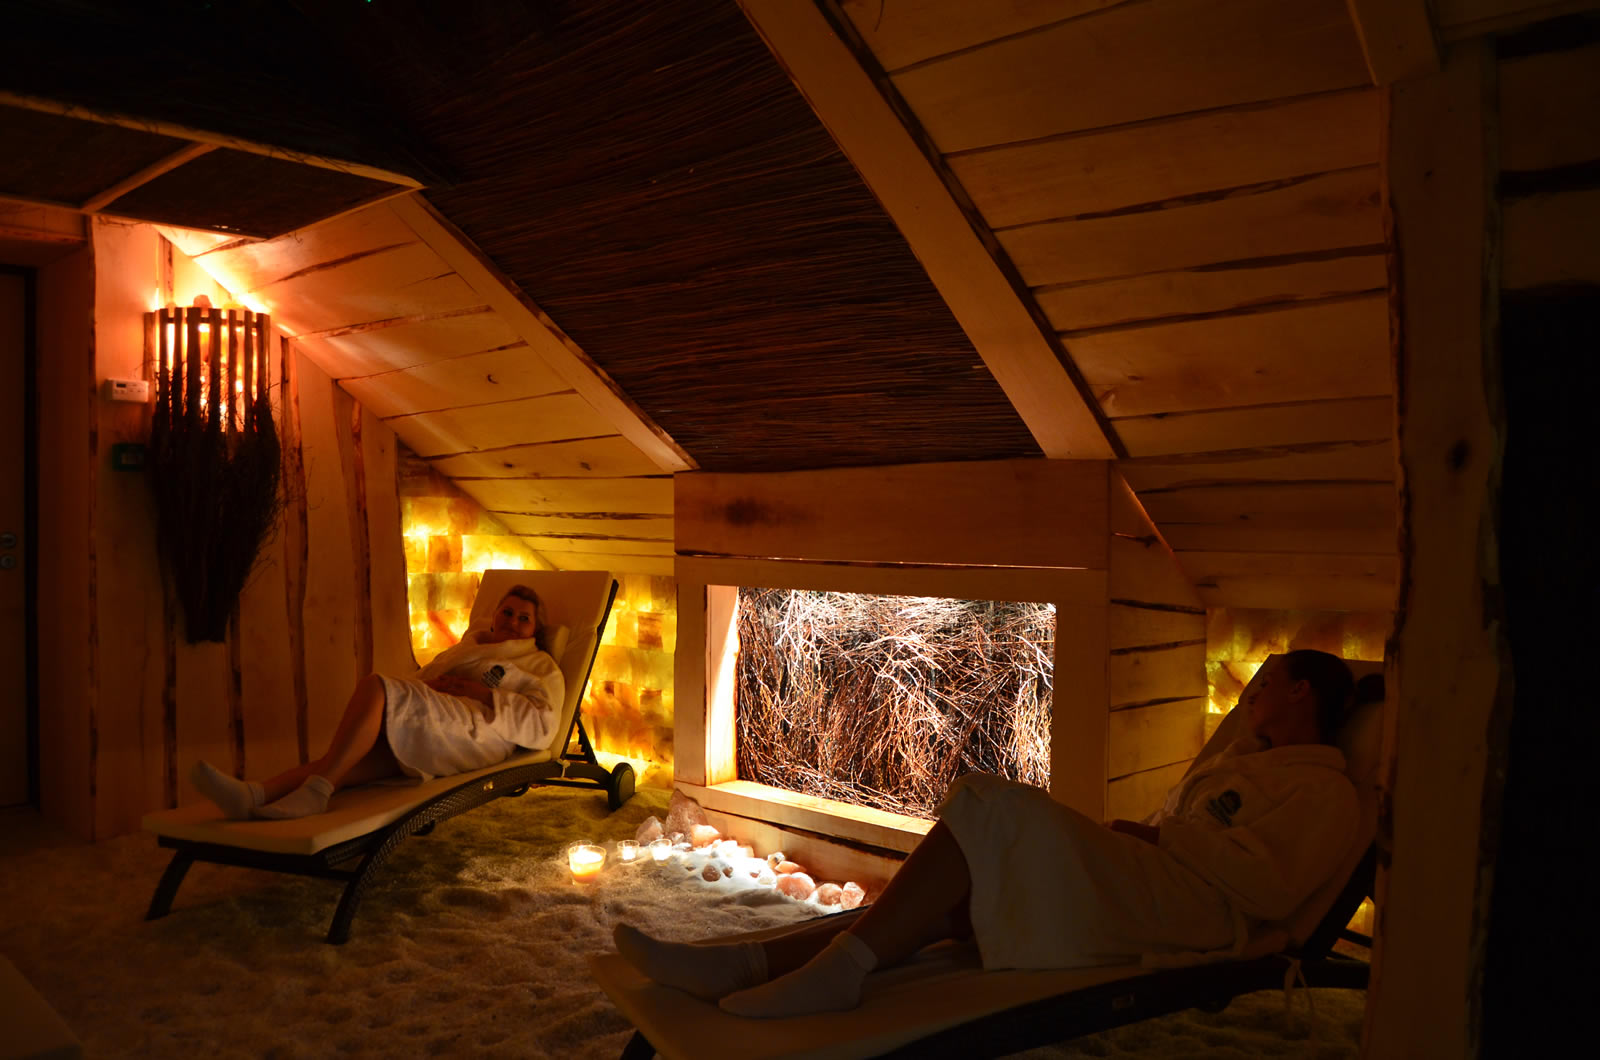 http://u.profitroom.pl/hotel-zubrowka.pl/uploads/201310291438160.grotaSolna.jpg